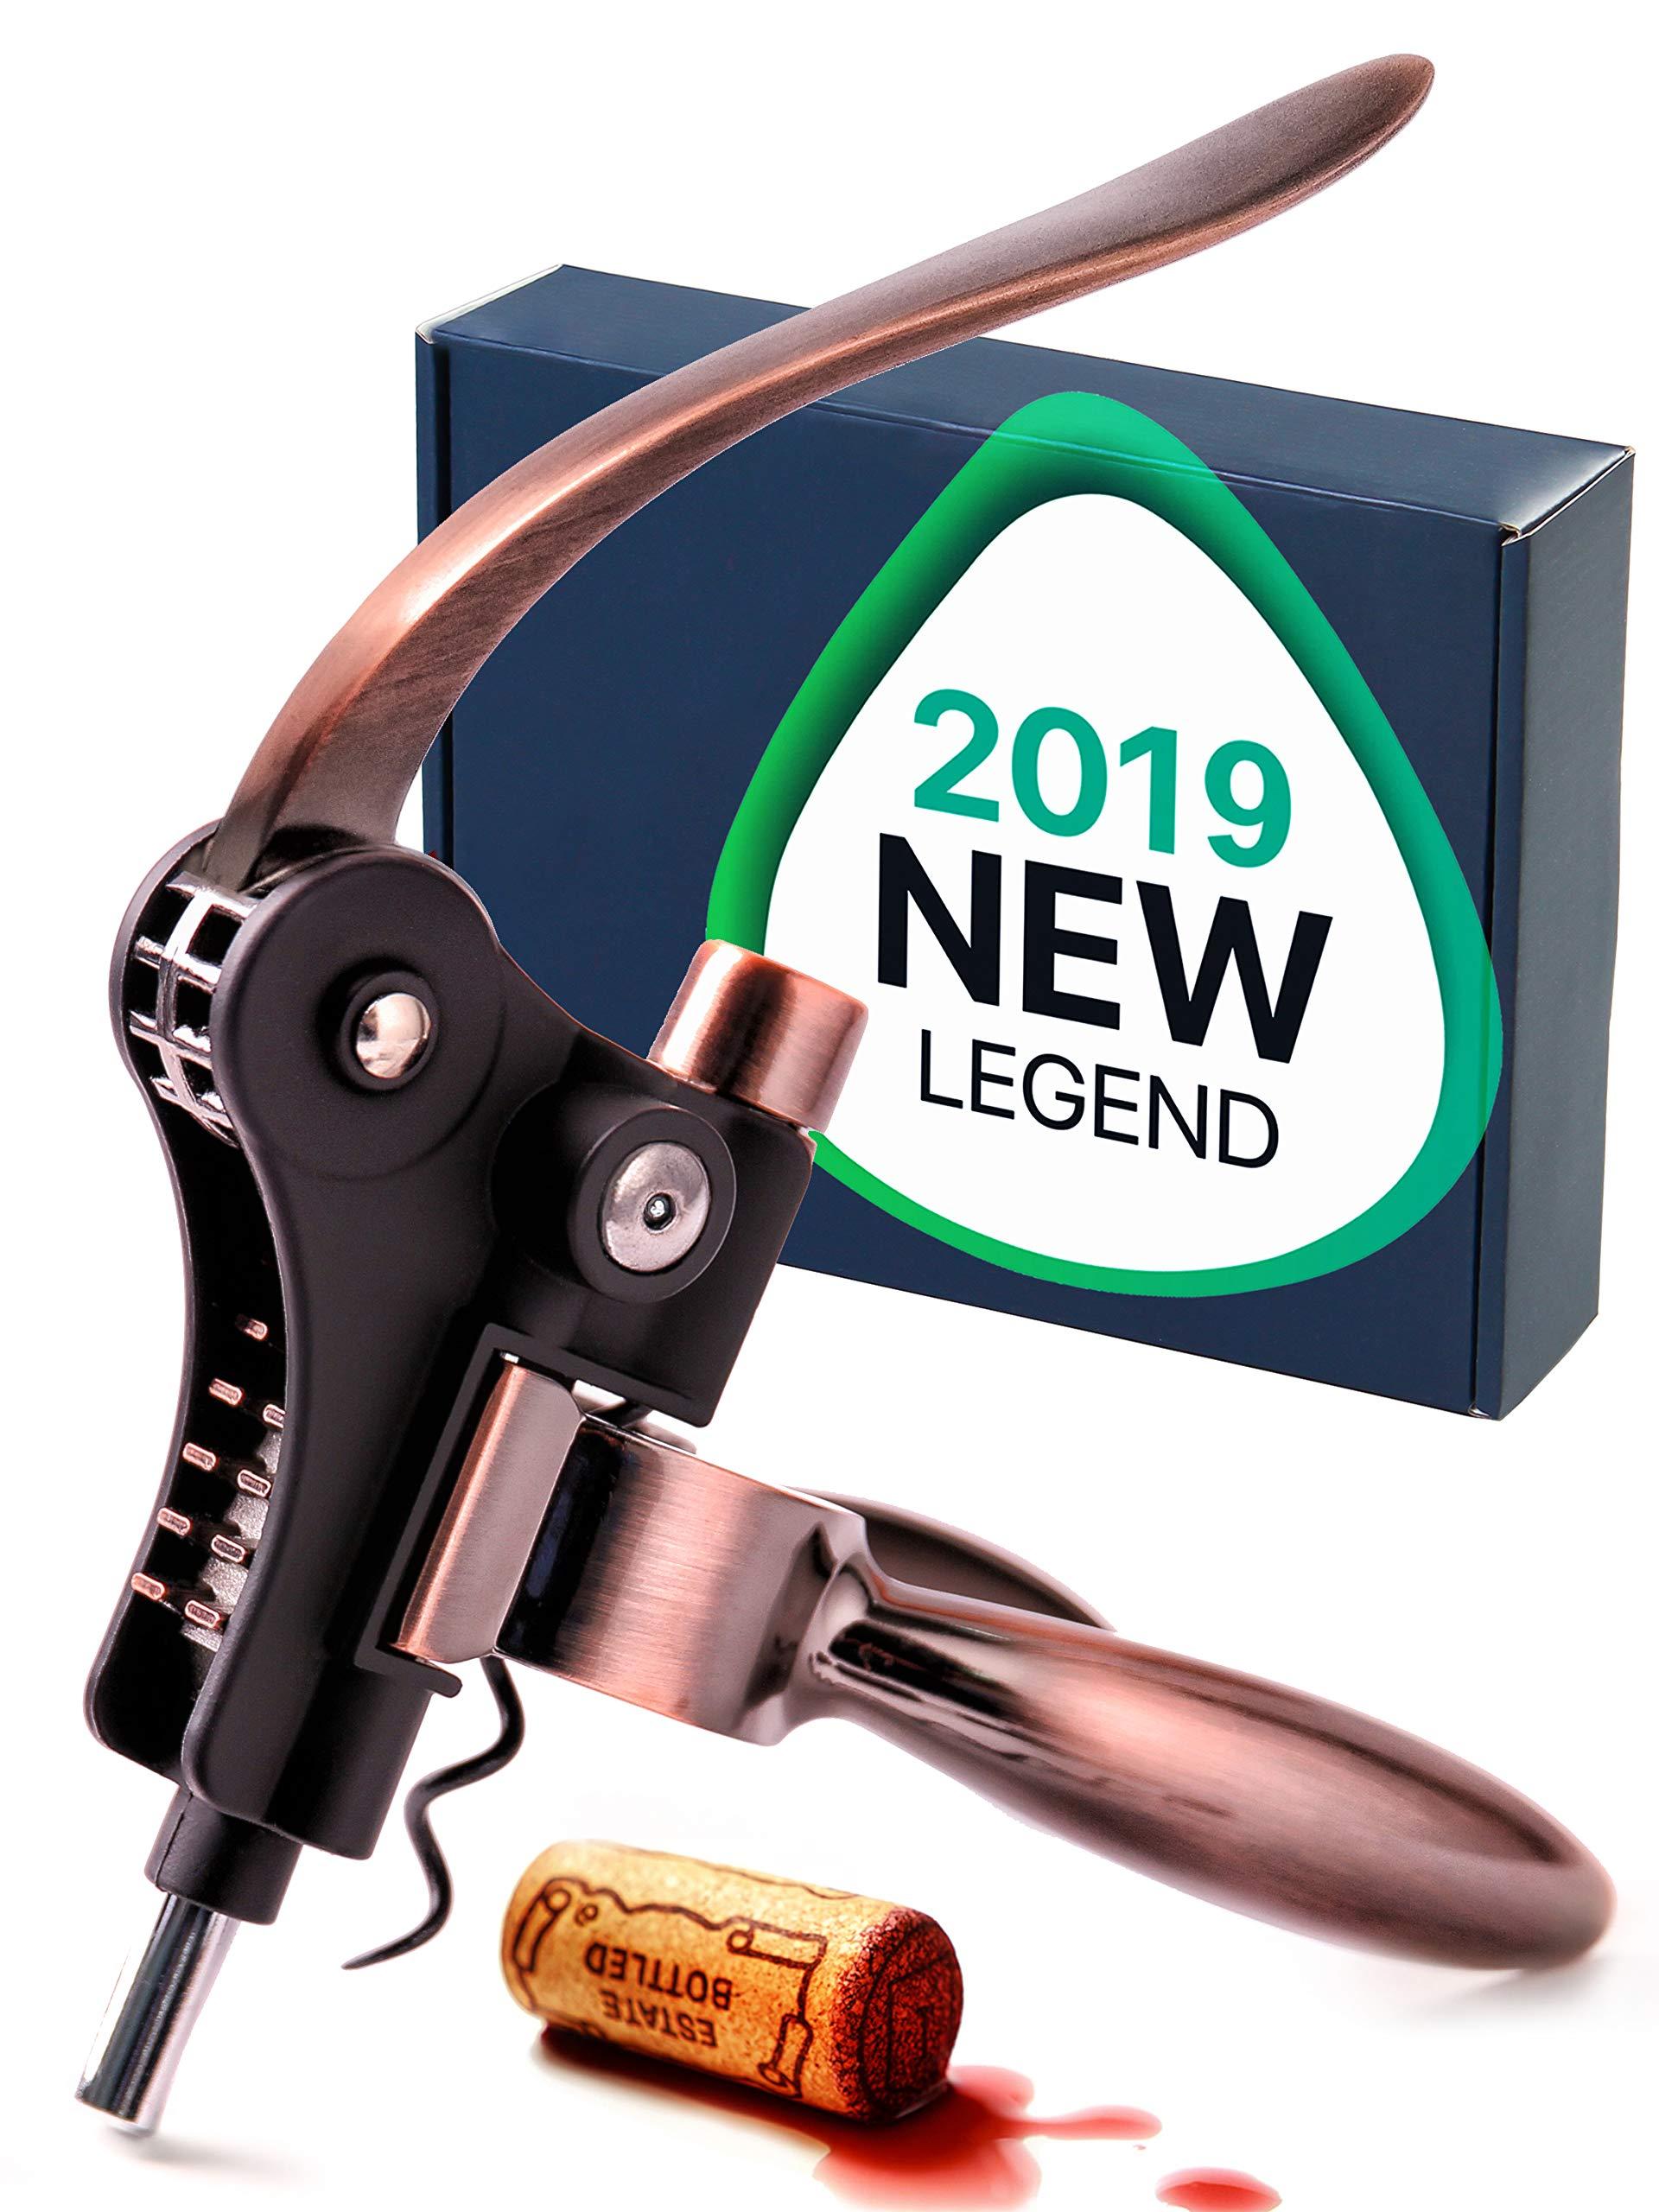 Wine Opener - Wine Accessories - Wine Corkscrew - The Best Wine Tool Kit For Women - Large Manual Wine Set For Men - Lever Cork Opener by RedNoel